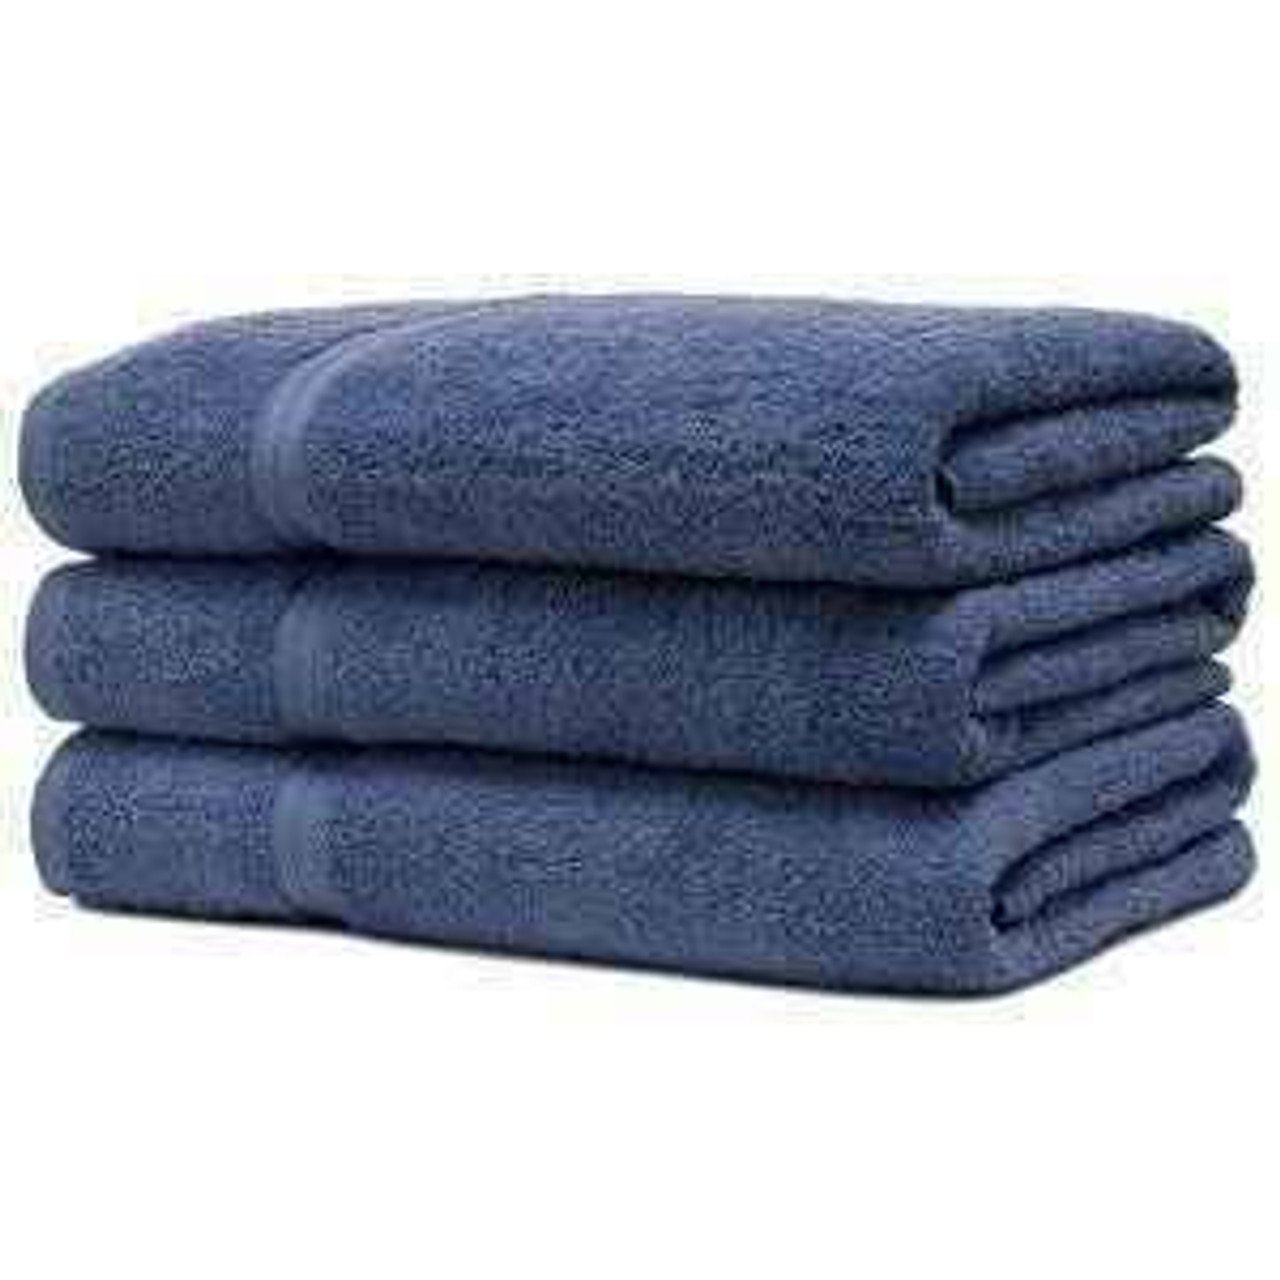 WestPoint/Martex Westpoint or Martex Classic or Pocelain Blue Dobby Pool Towel or 1dz